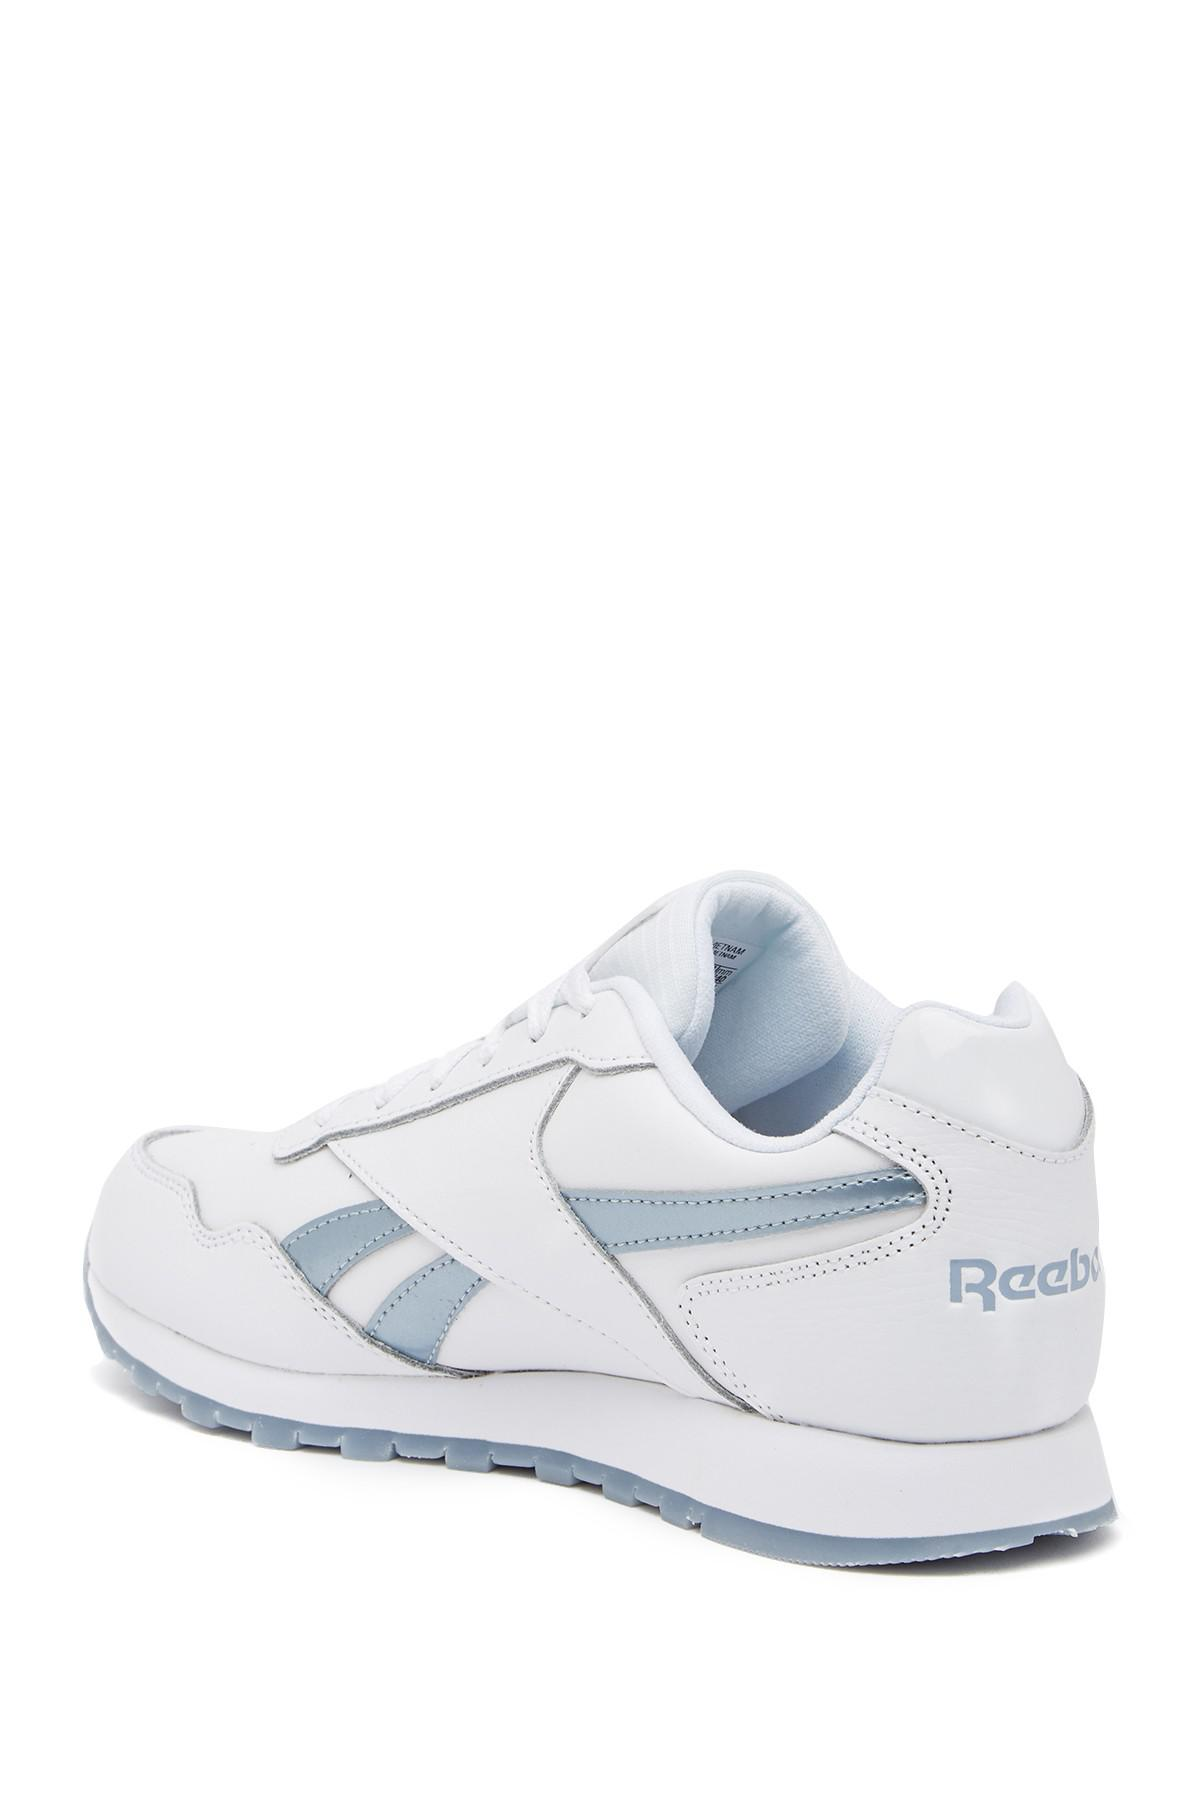 e4265e7392f68 Reebok - White Classic Harman Run Leather Sneaker - Lyst. View fullscreen